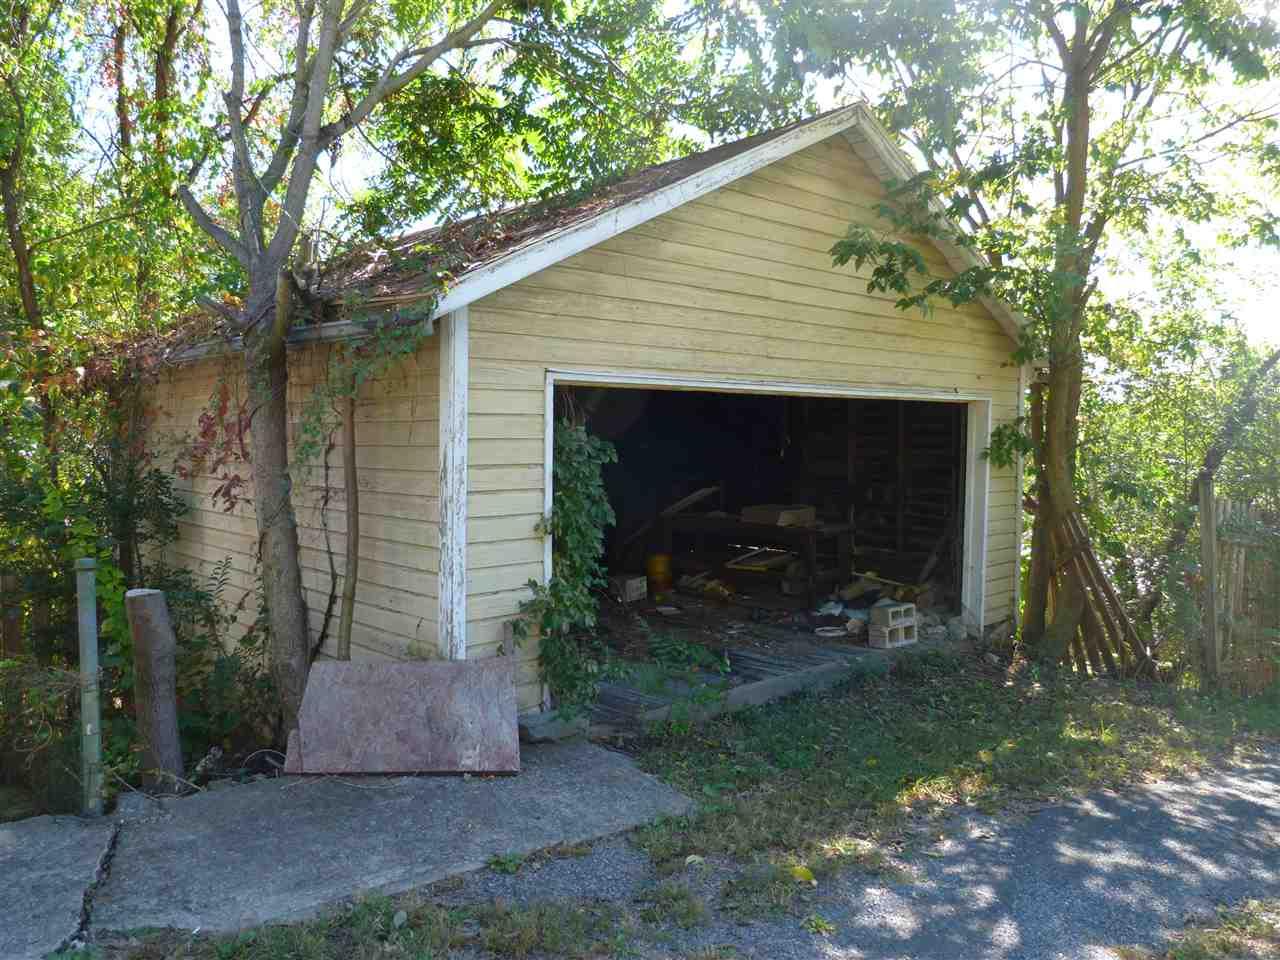 418 Baltimore Ave, Staunton, VA, 24401